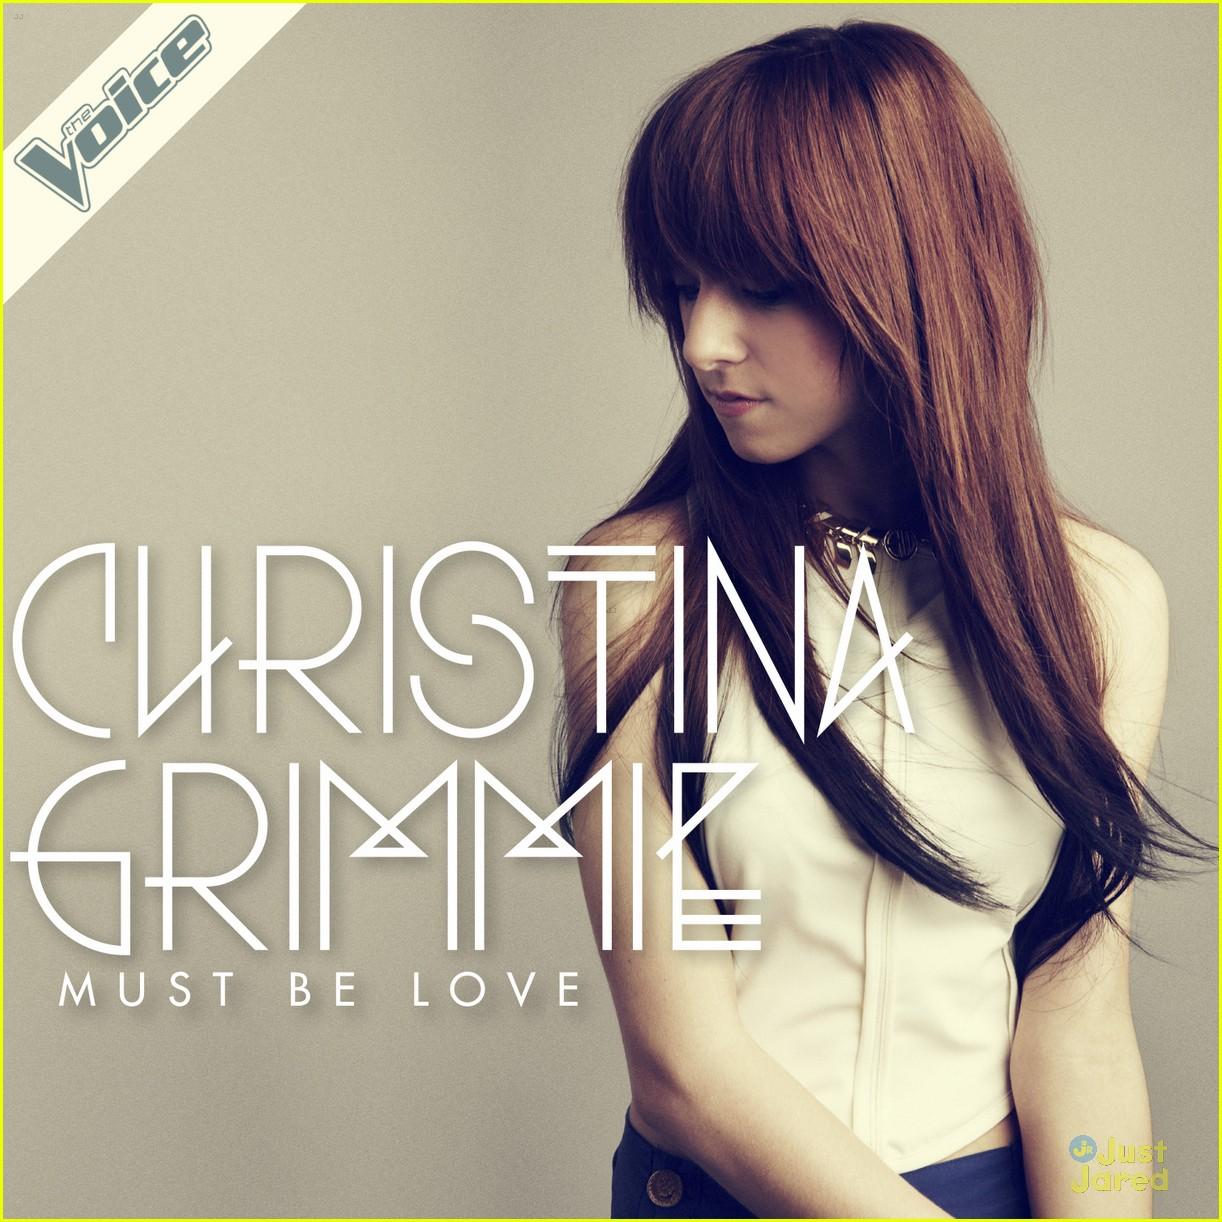 ChristinaGrimmie_MustBeLoveSingle.jpg